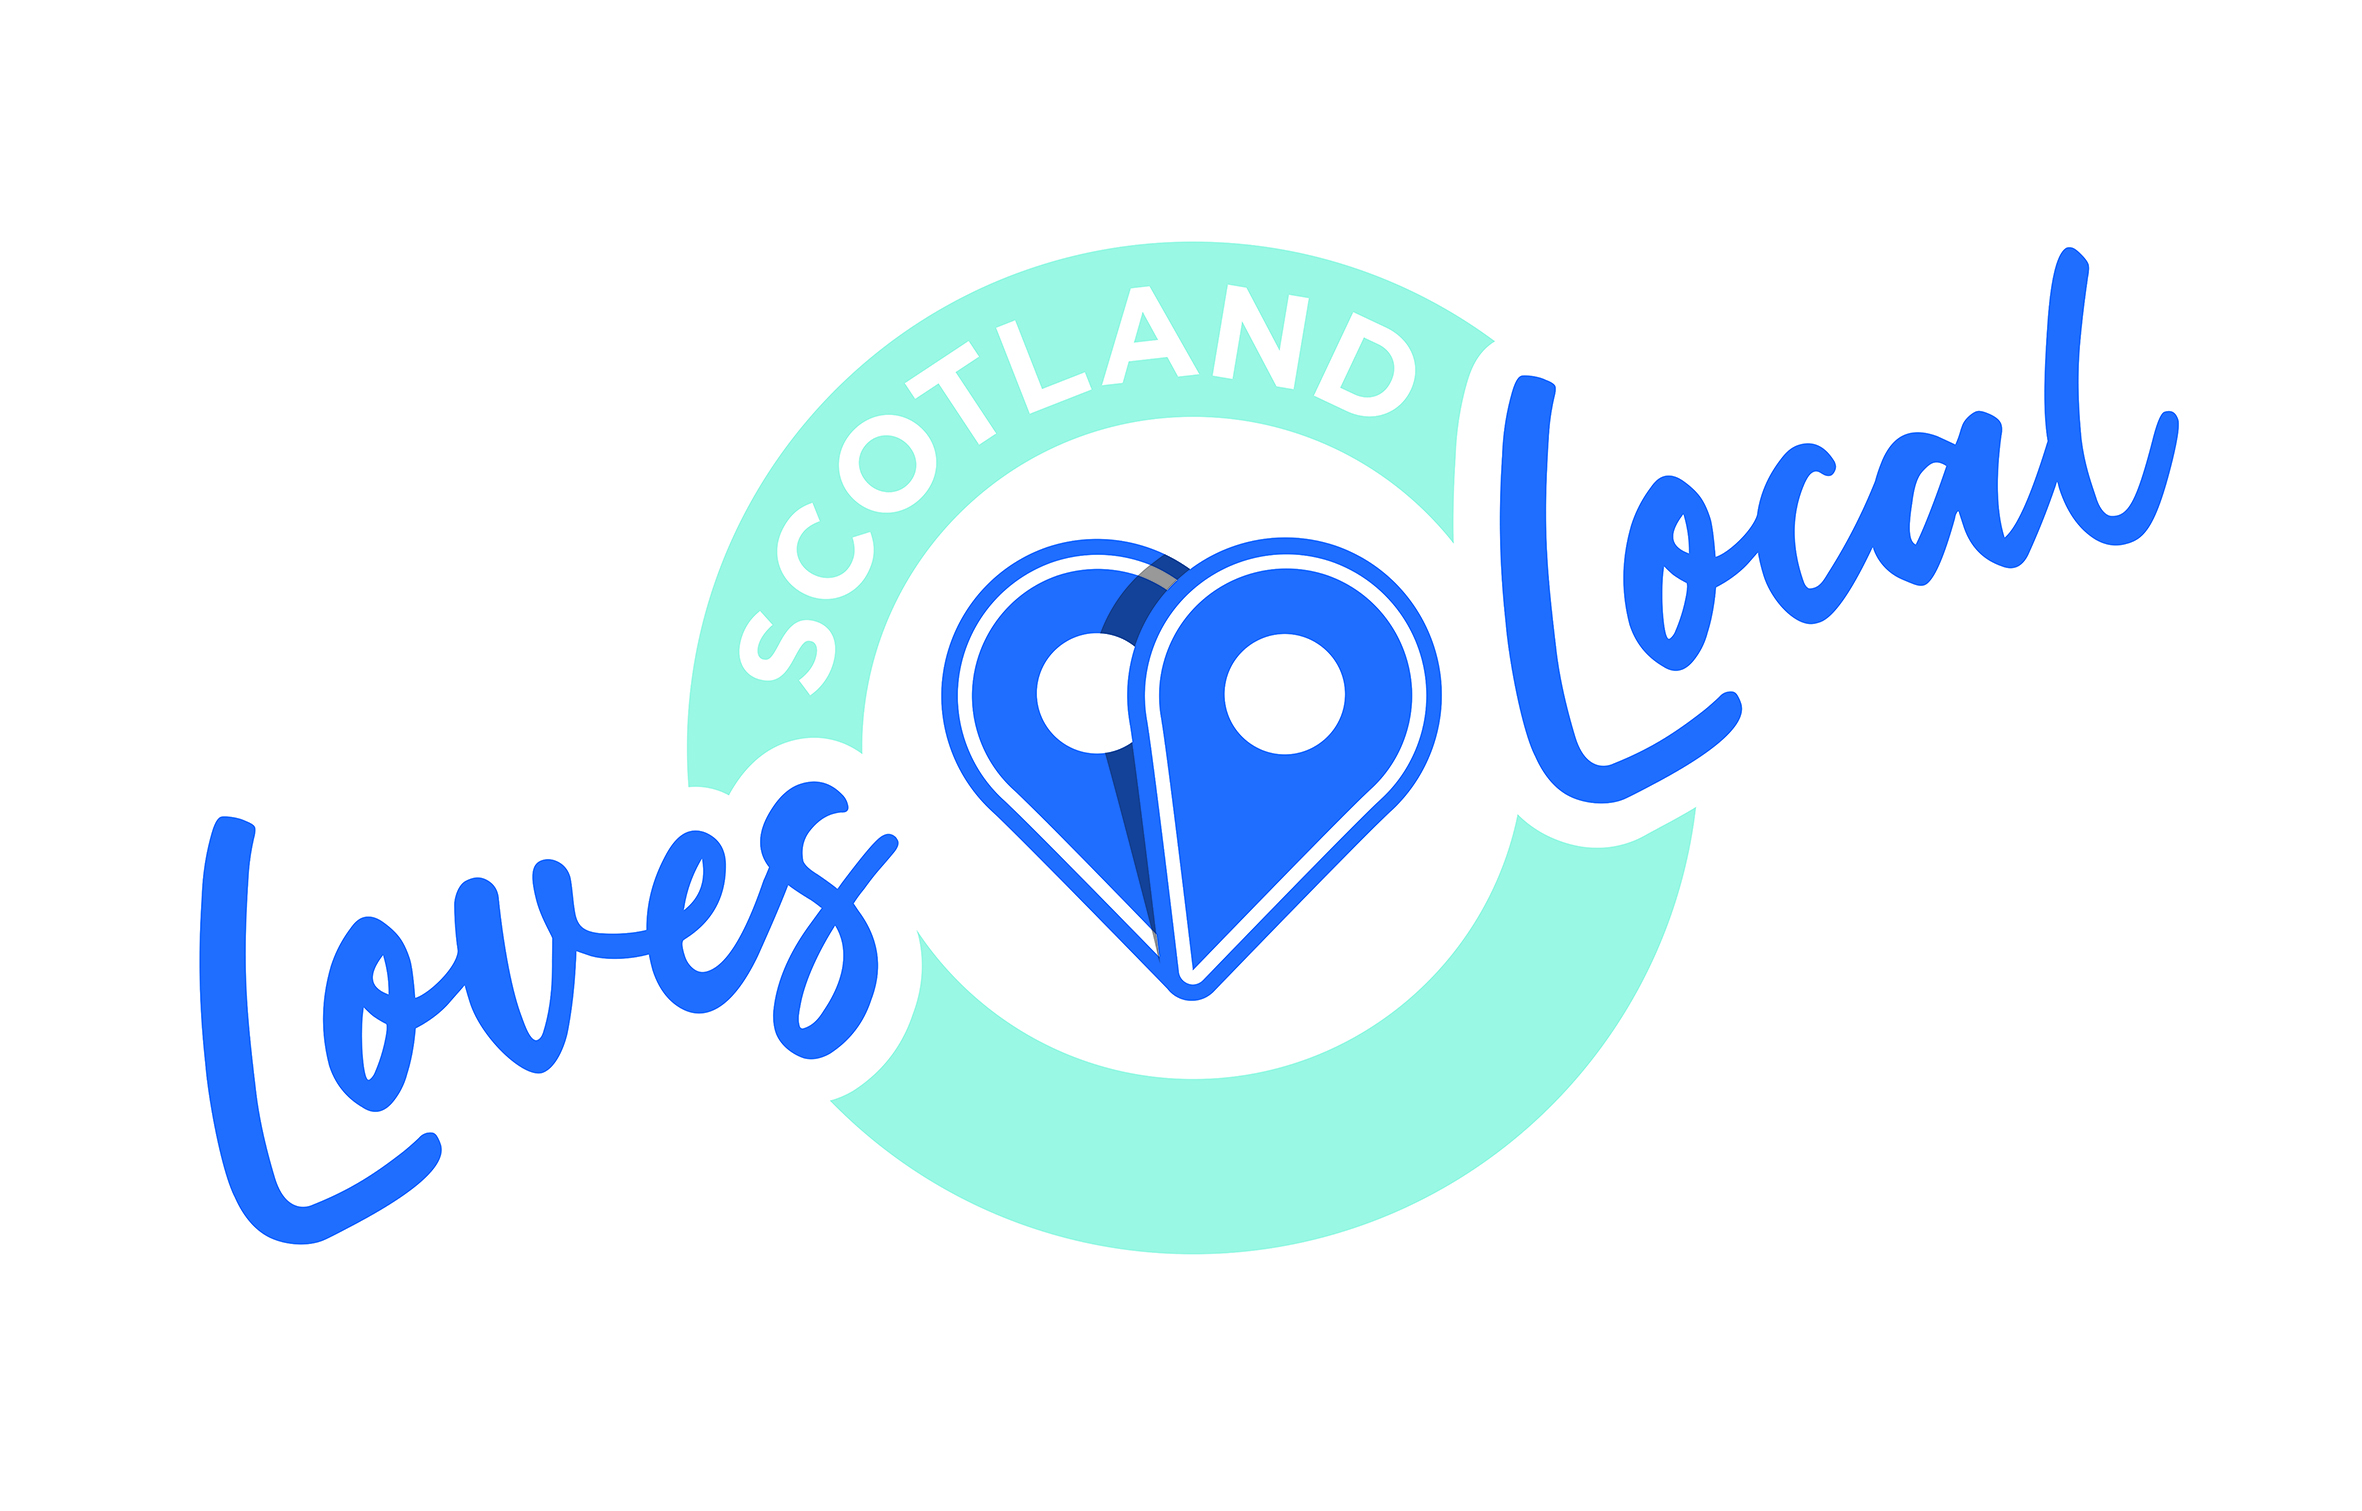 The Scotland Loves Local branding.